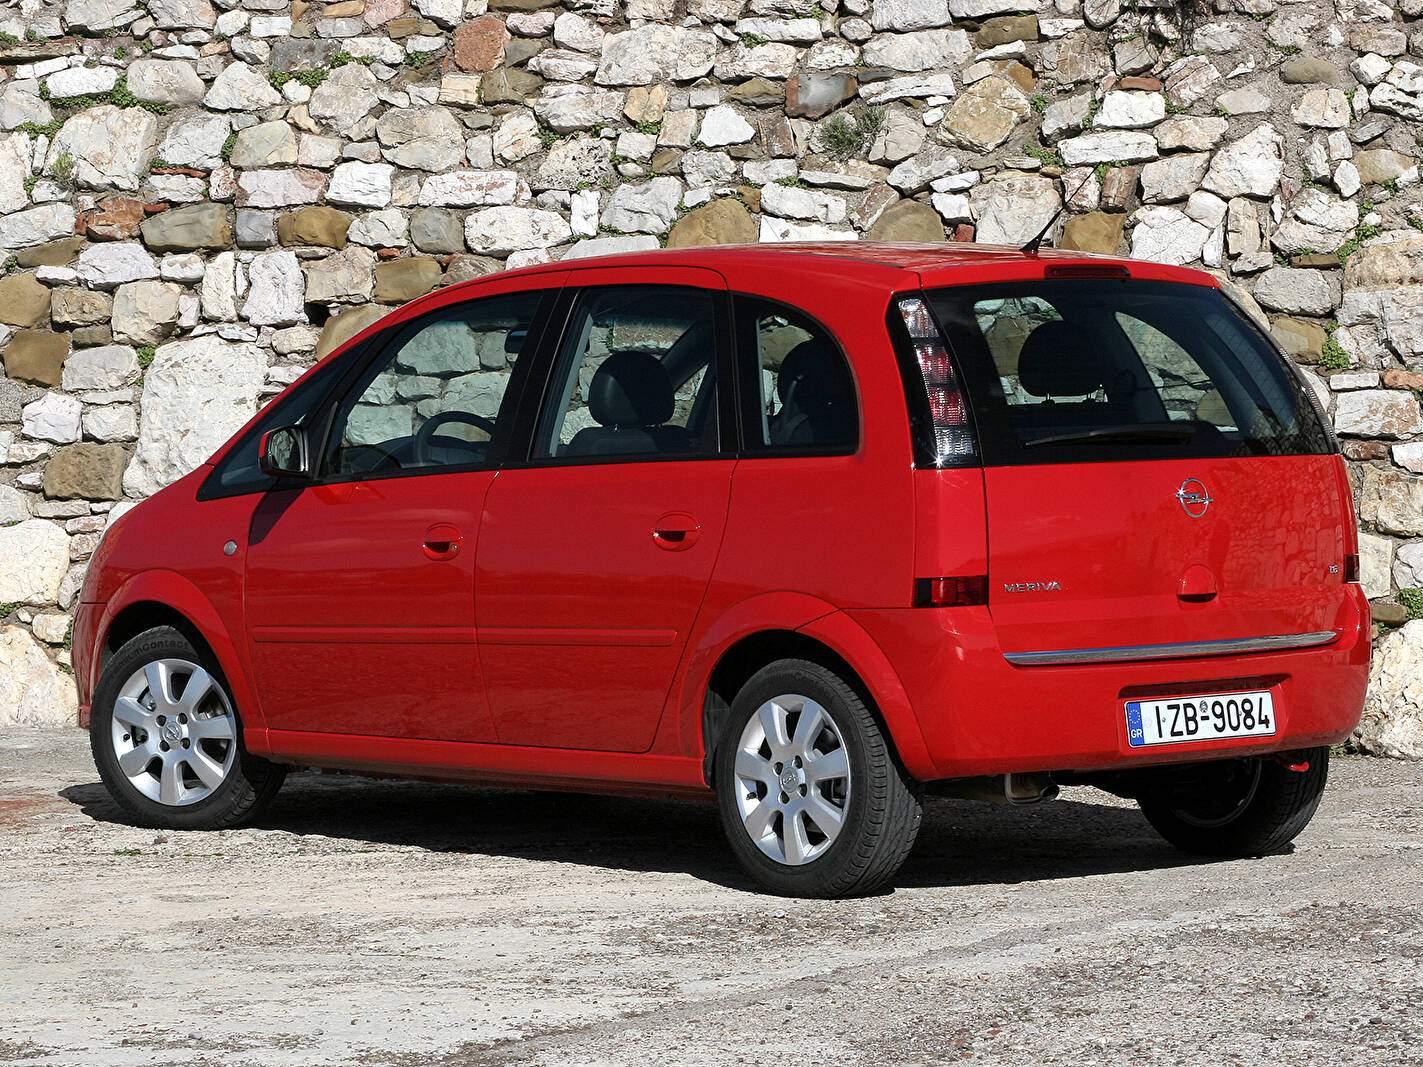 Opel Meriva 1.6 Twinport 105 (2005-2009),  ajouté par fox58